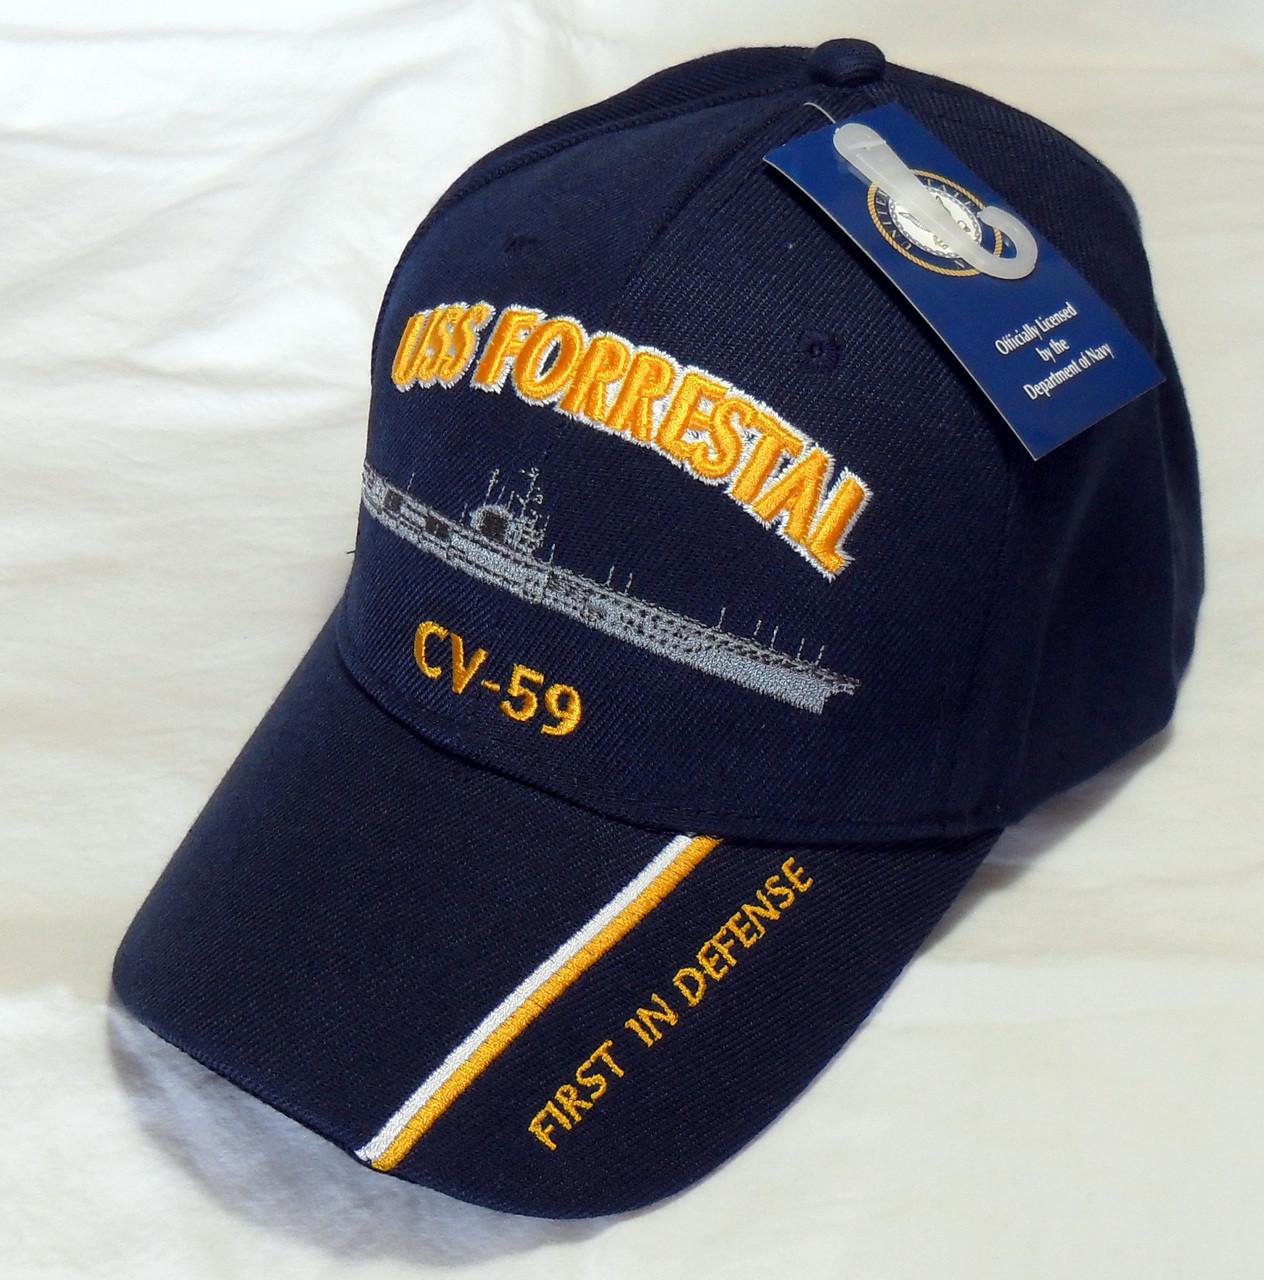 USS FORRESTAL CV-59 US NAVY SHIP HAT OFFICIALLY LICENSED BASEBALL CAP a7357720a18